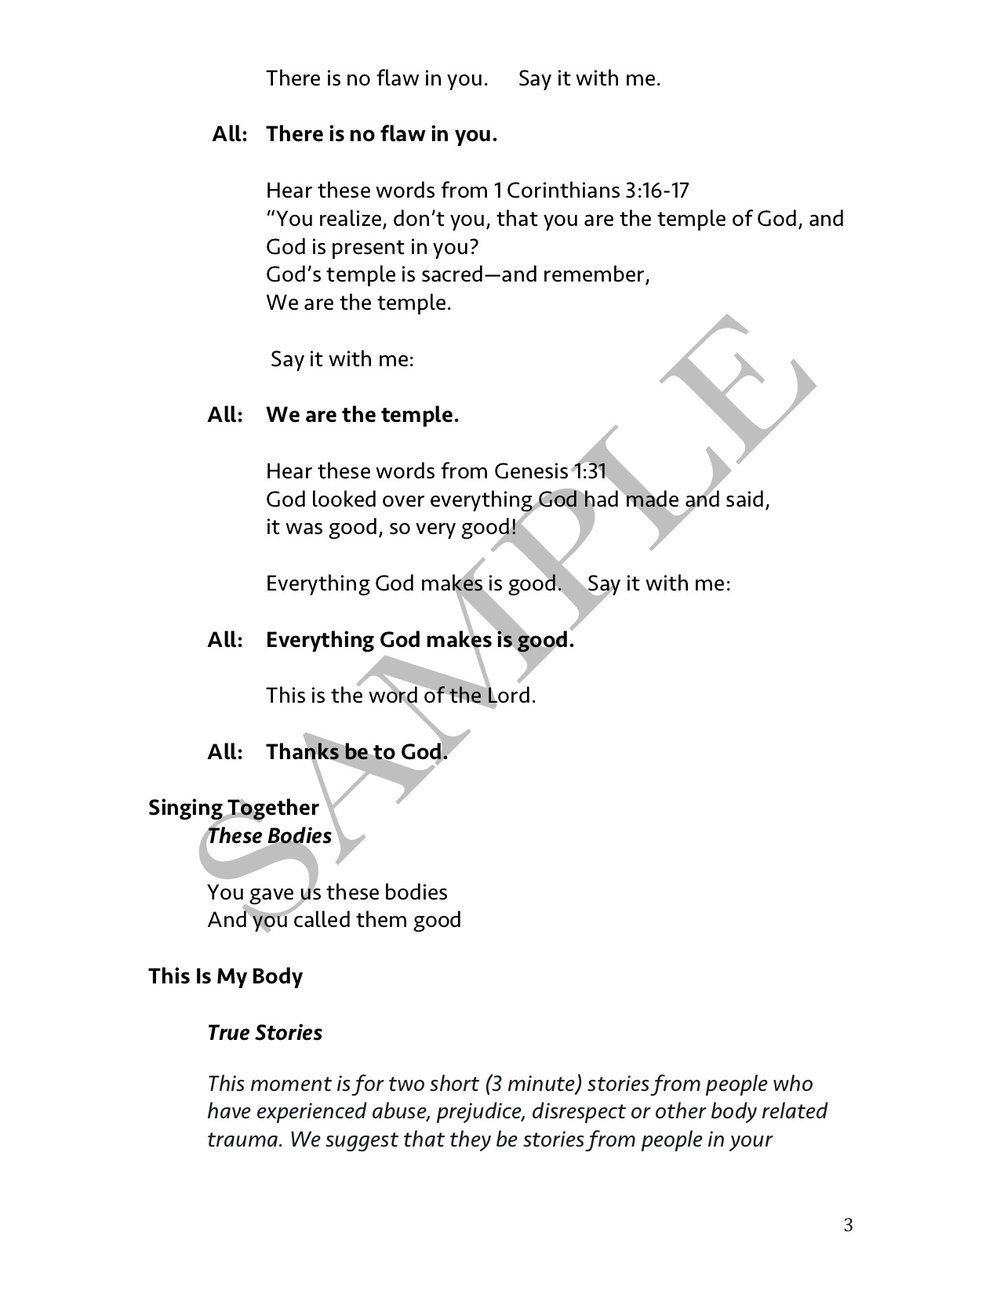 This is My body liturgy sample2.jpg